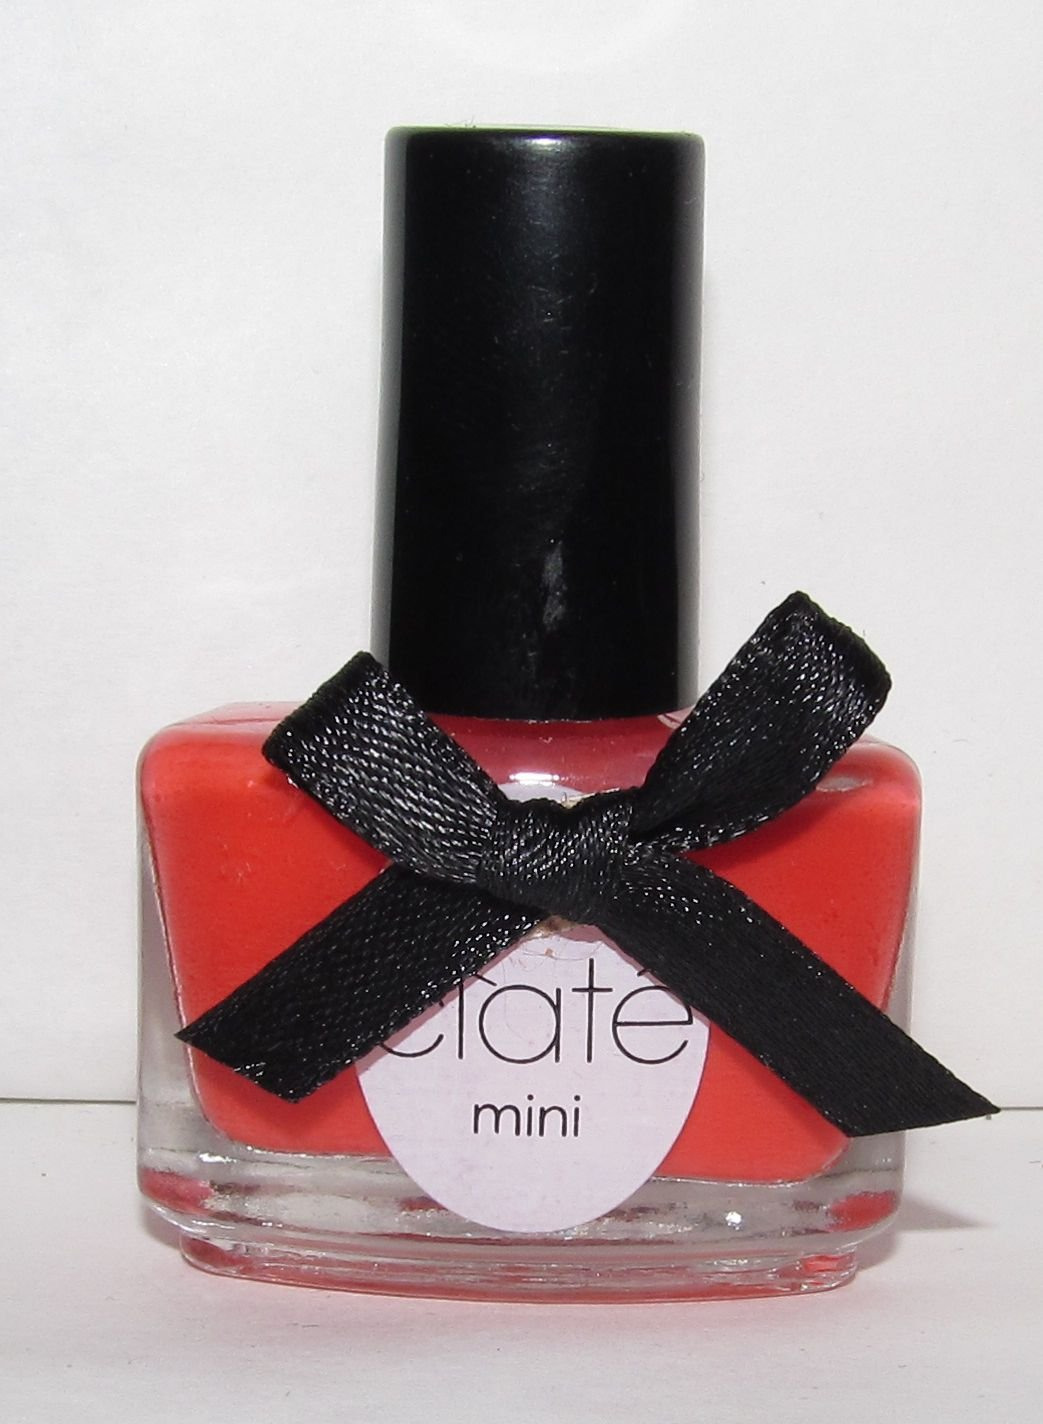 Ciate Nail Polish - speed dial 023 - mini bottle NEW